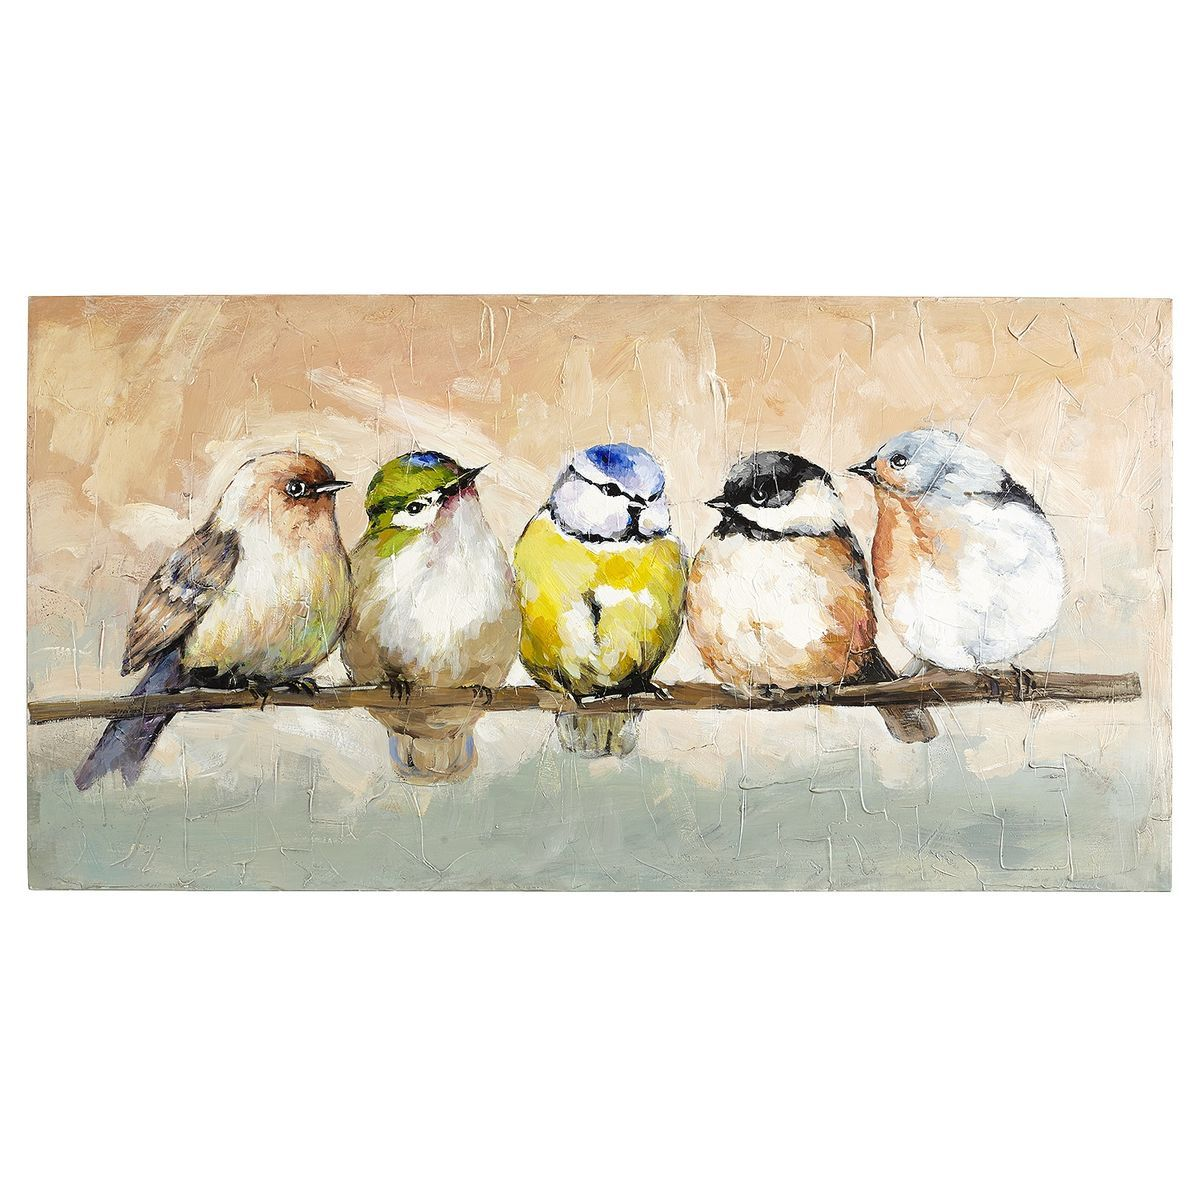 Society of Birds Art   Pier 1 Imports   bird decor   Pinterest ...